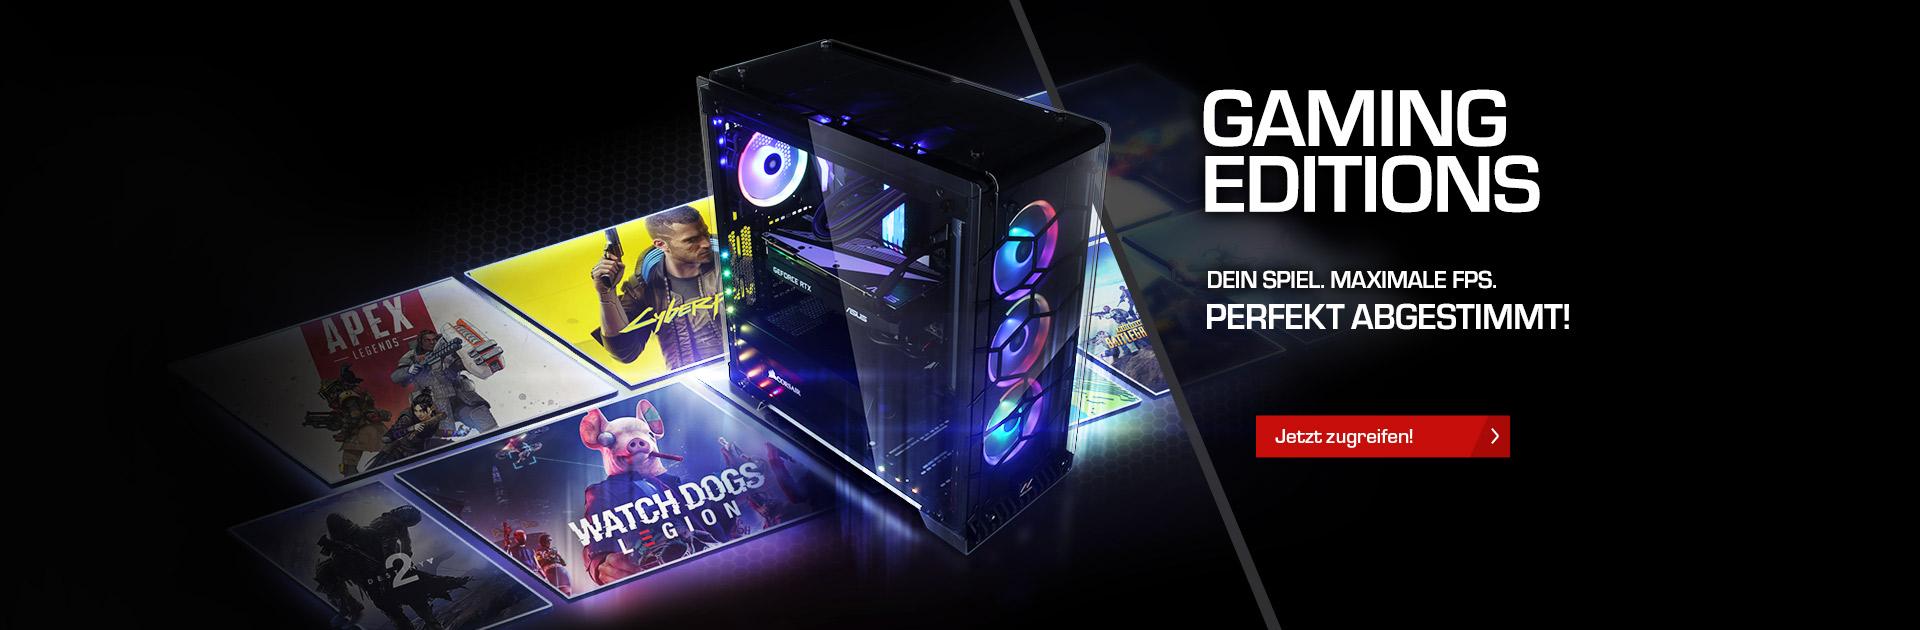 Gaming Editions